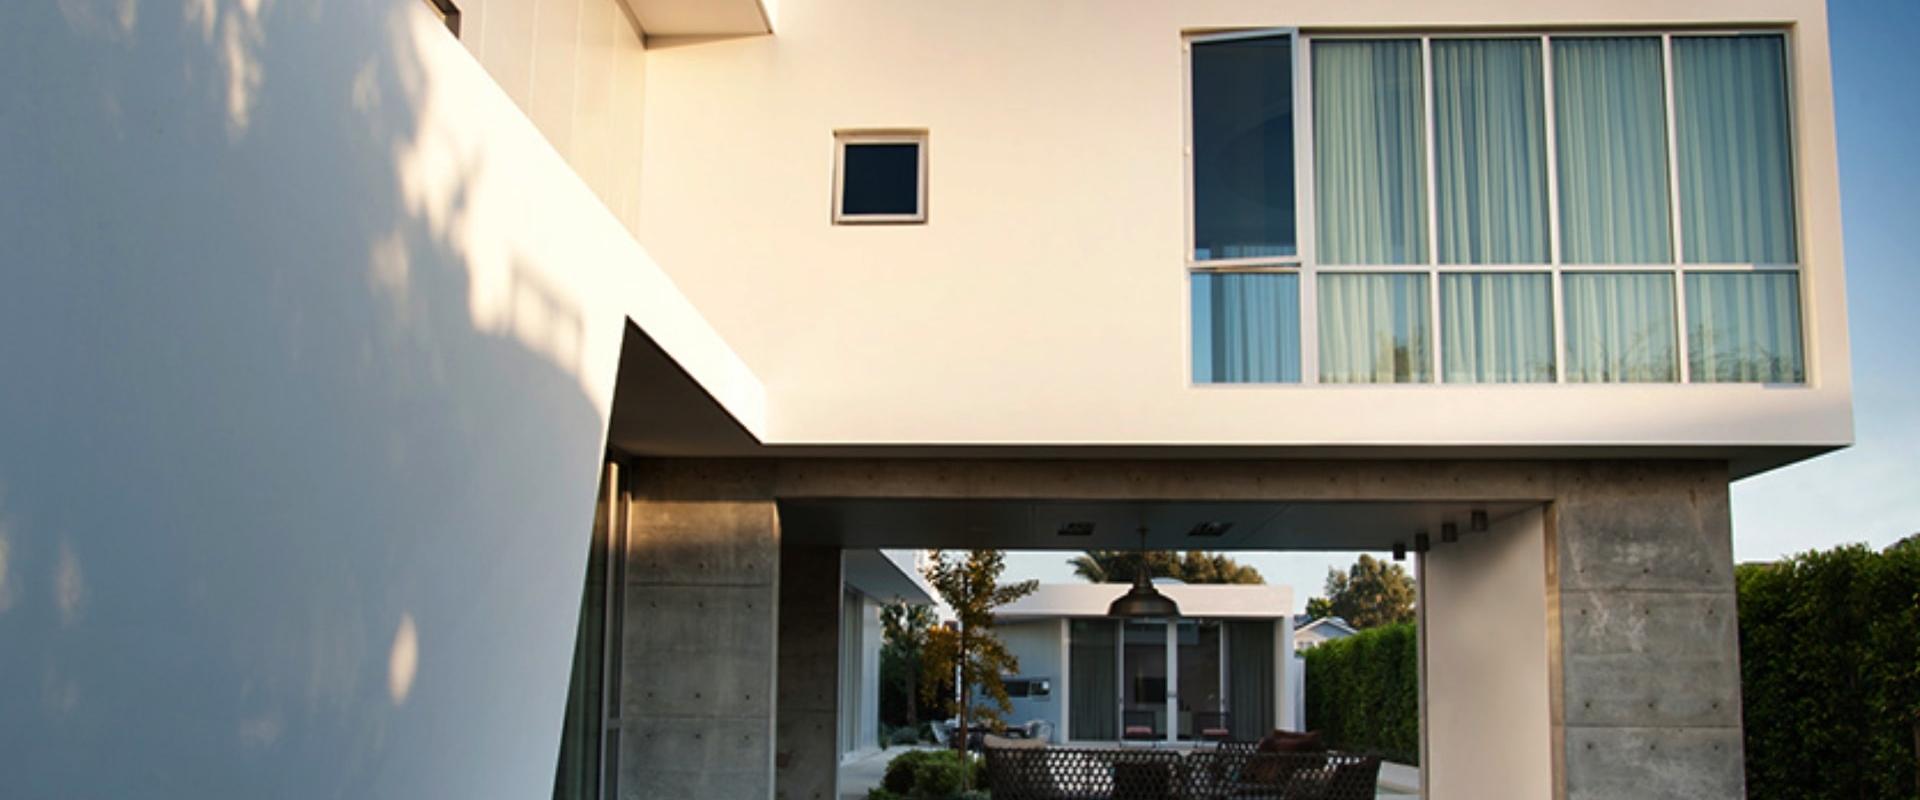 contemporary_home-min